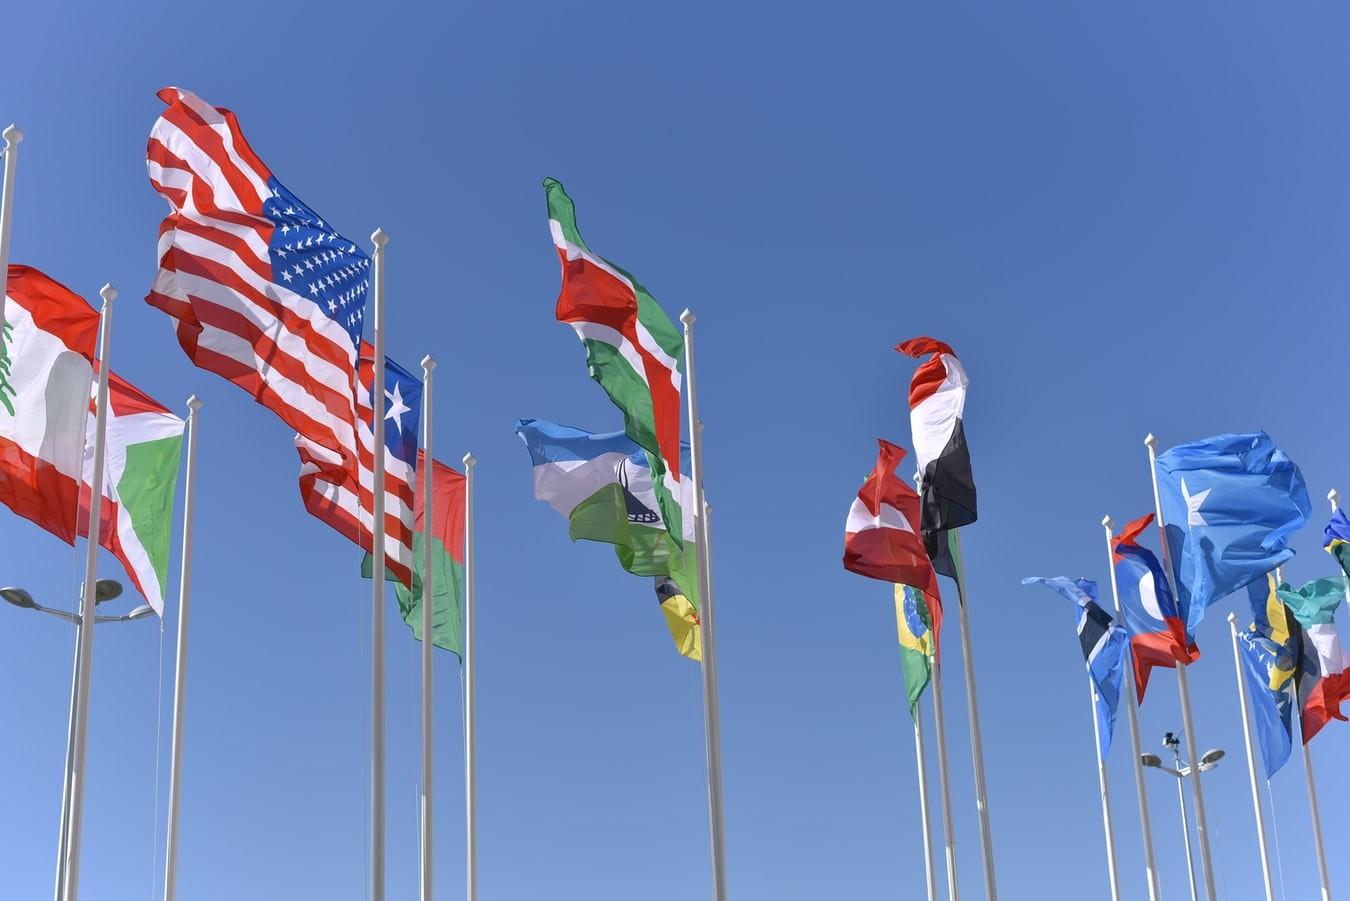 Several international flags